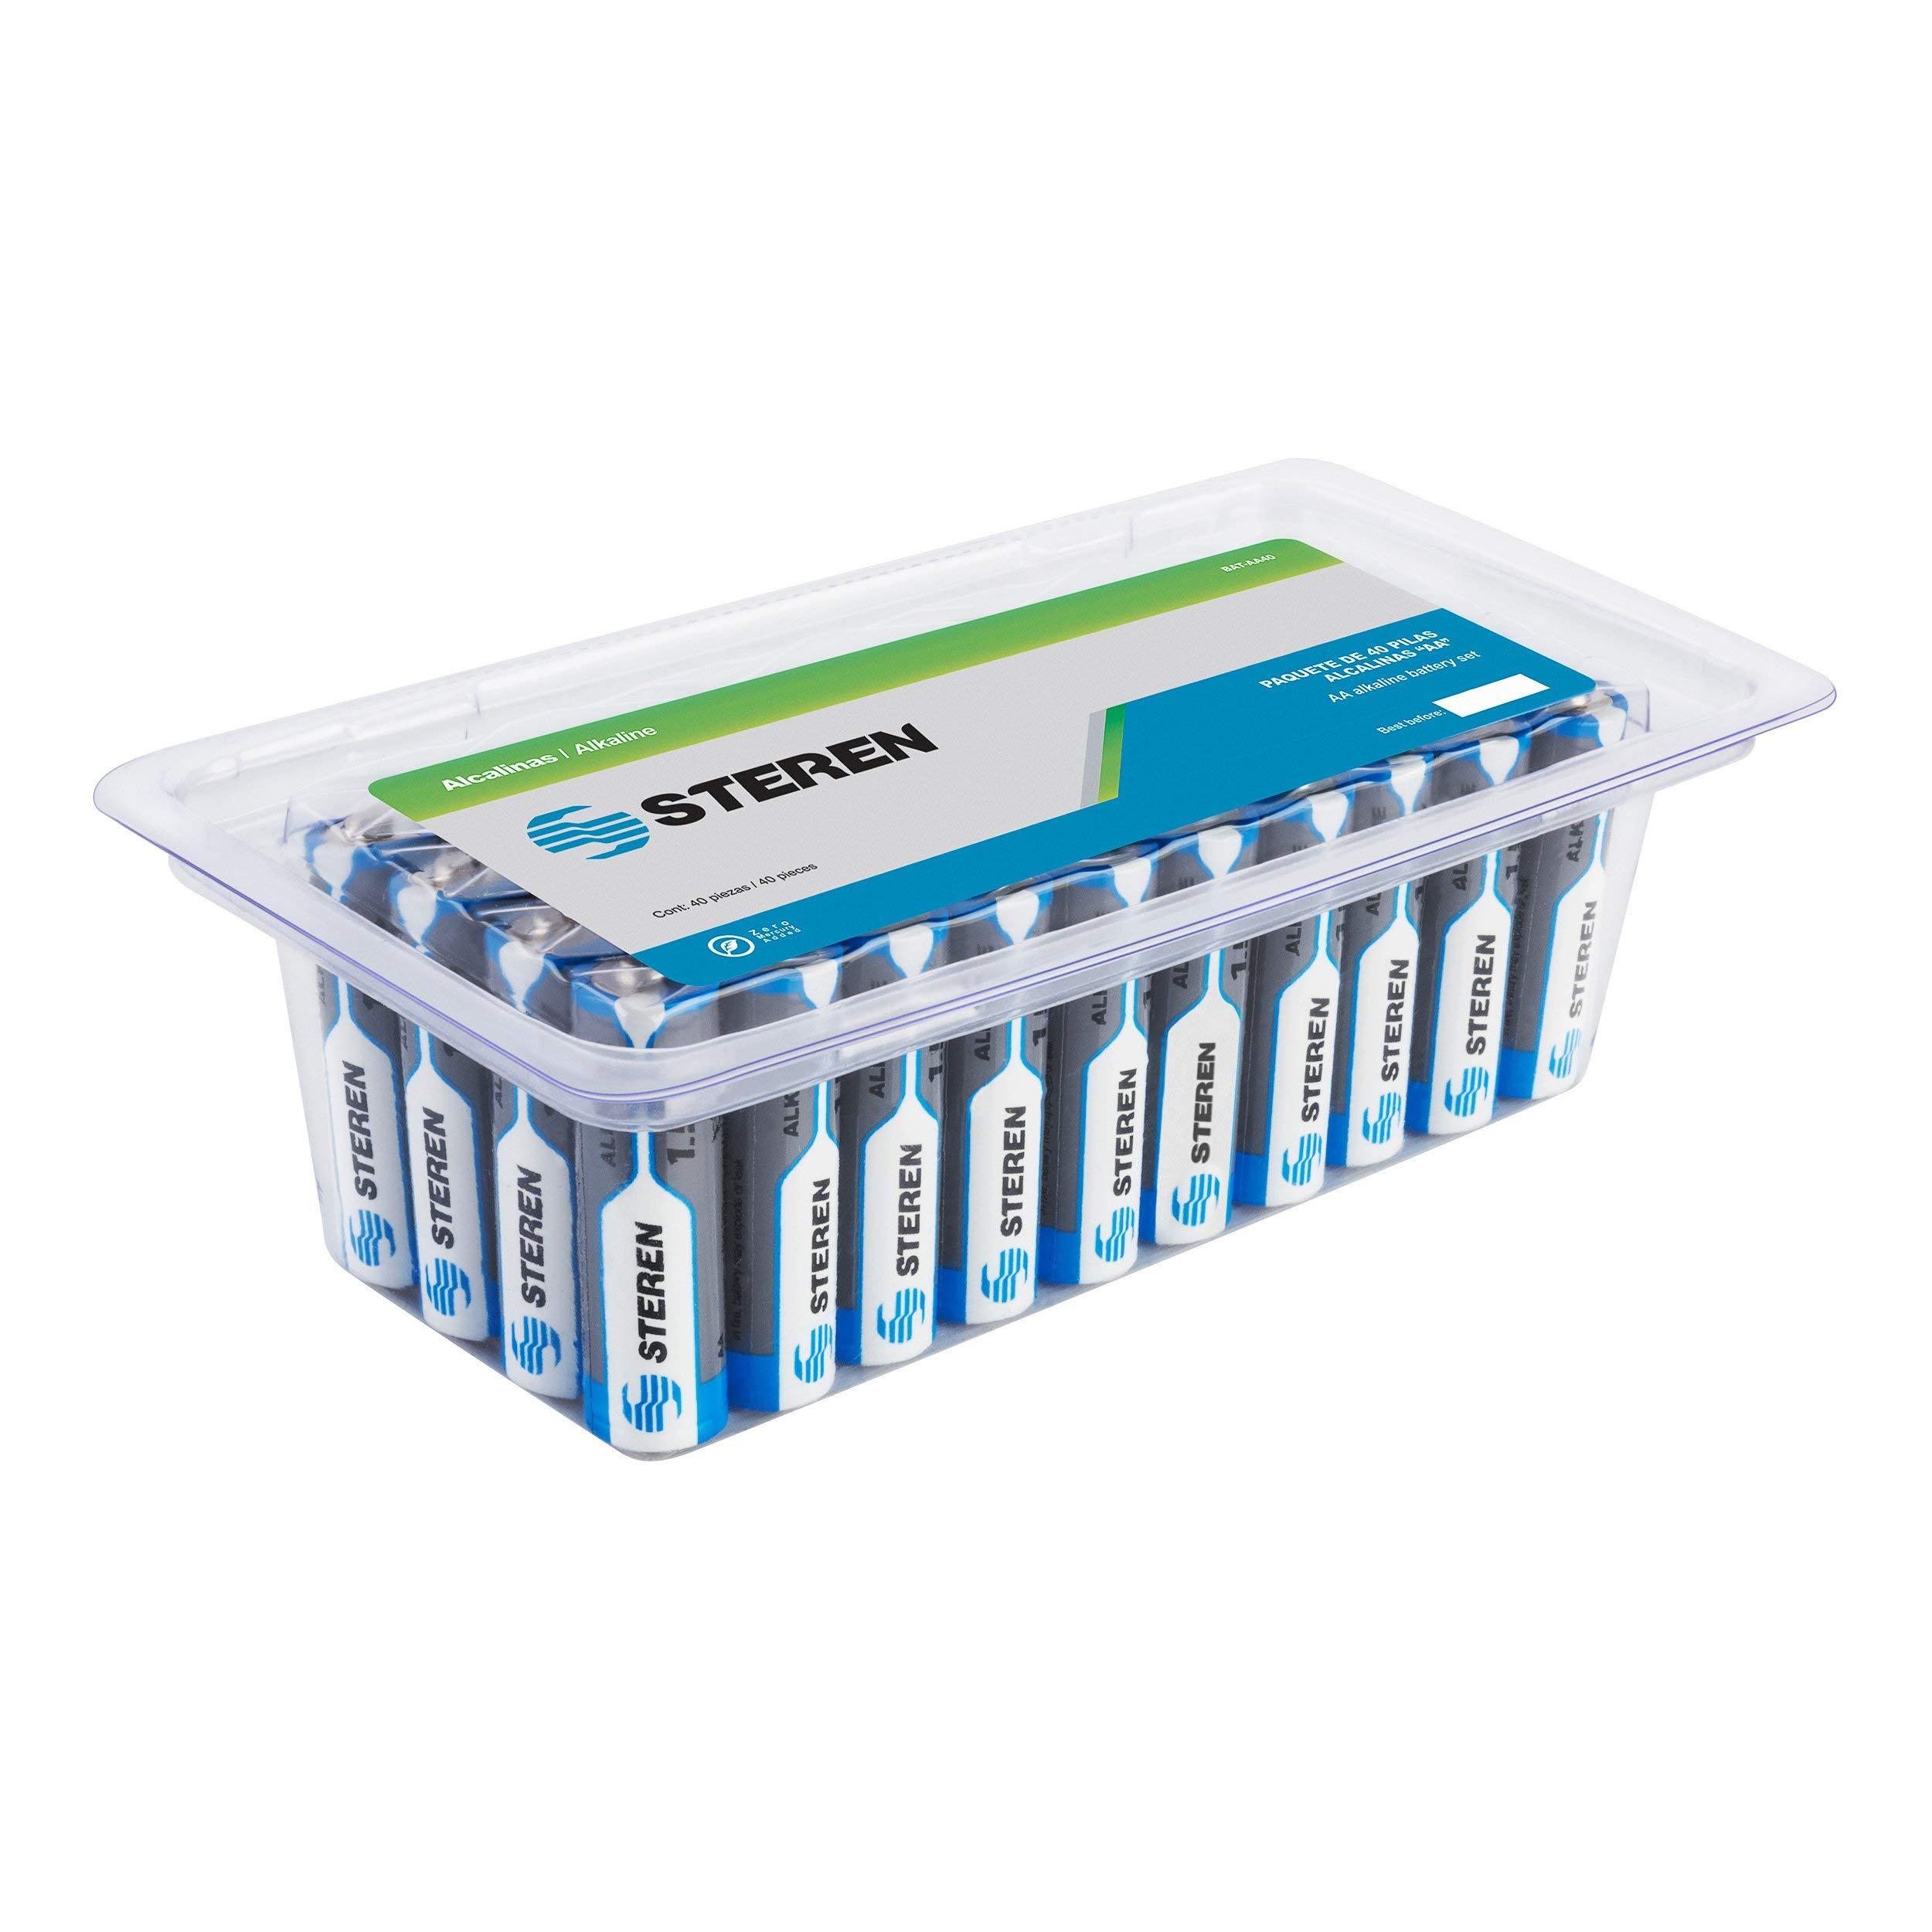 STEREN AA Alkaline Batteries (Pack of 40) by STEREN